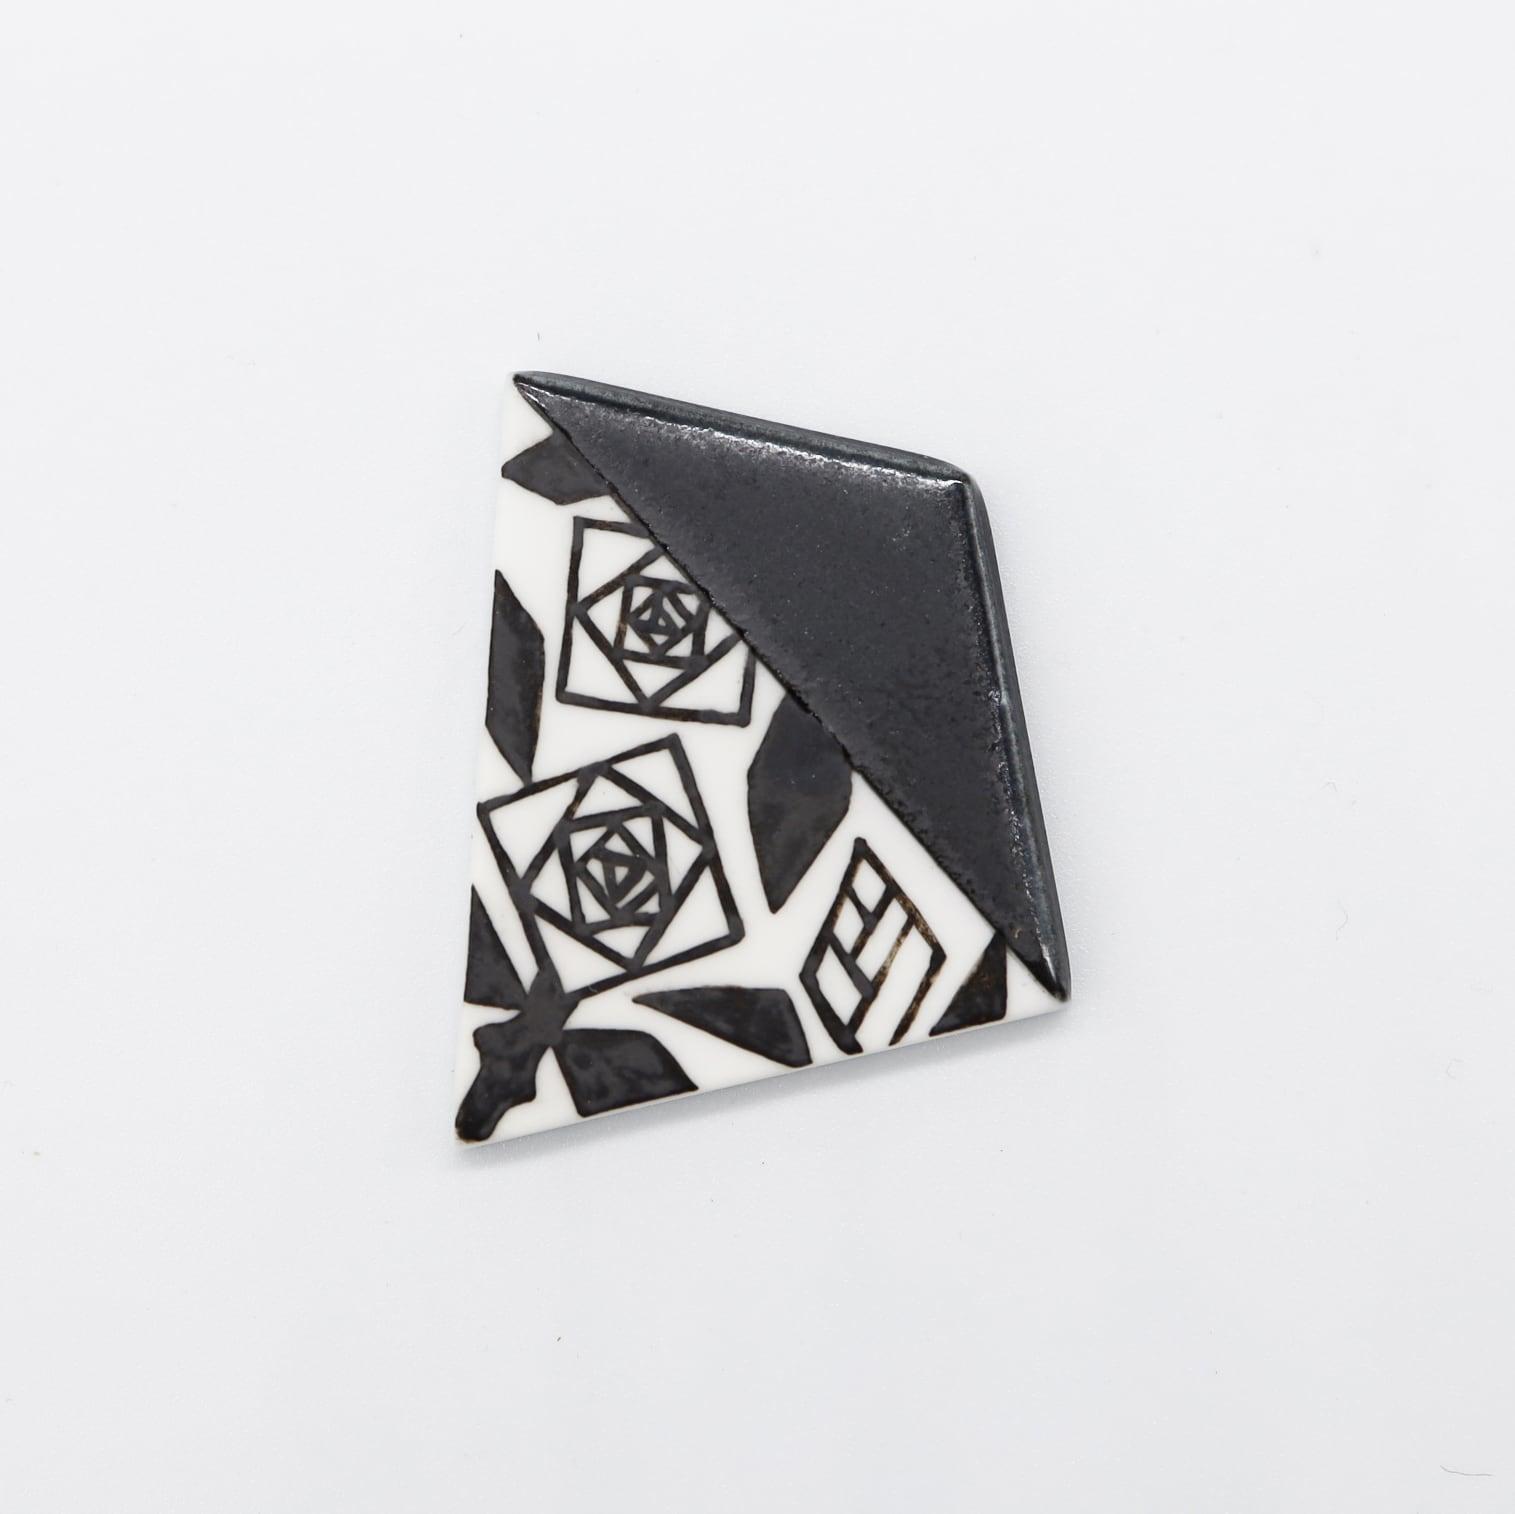 【eb2】マットブラック 薔薇 ブローチ/帯留